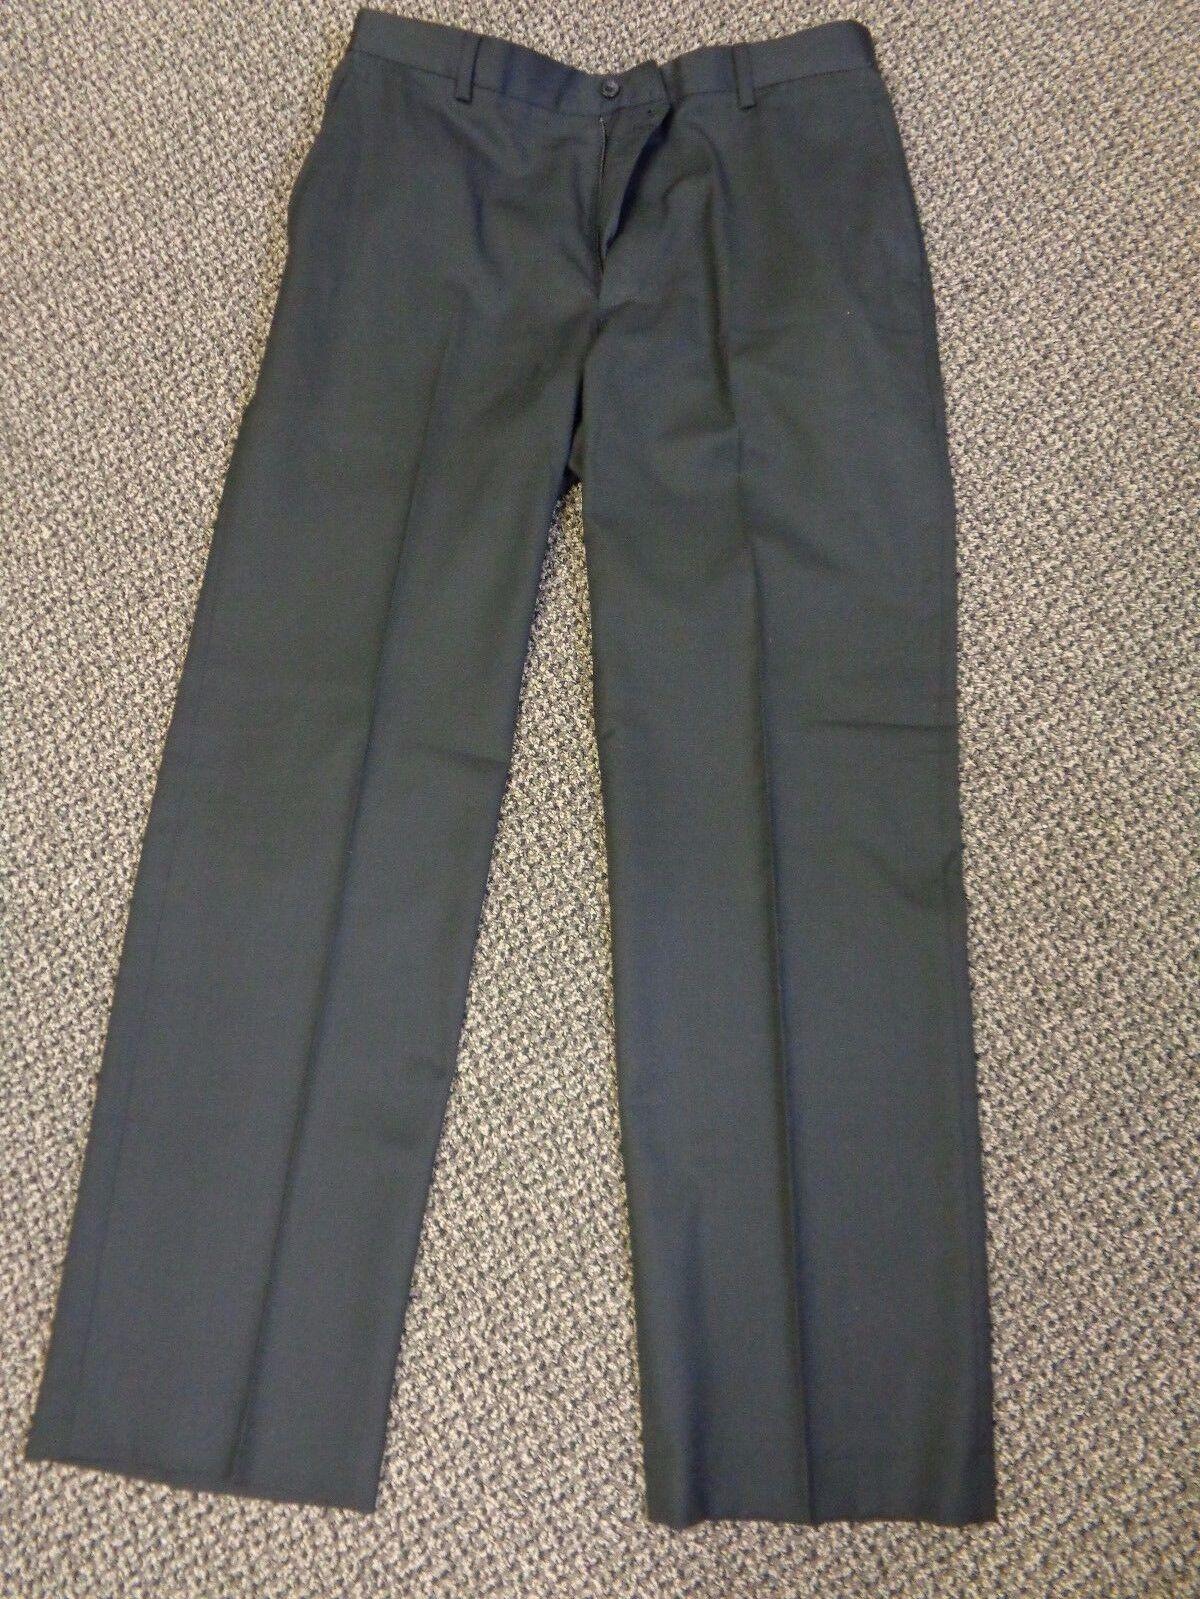 Vintage Men's Dress Pants Size 33x32